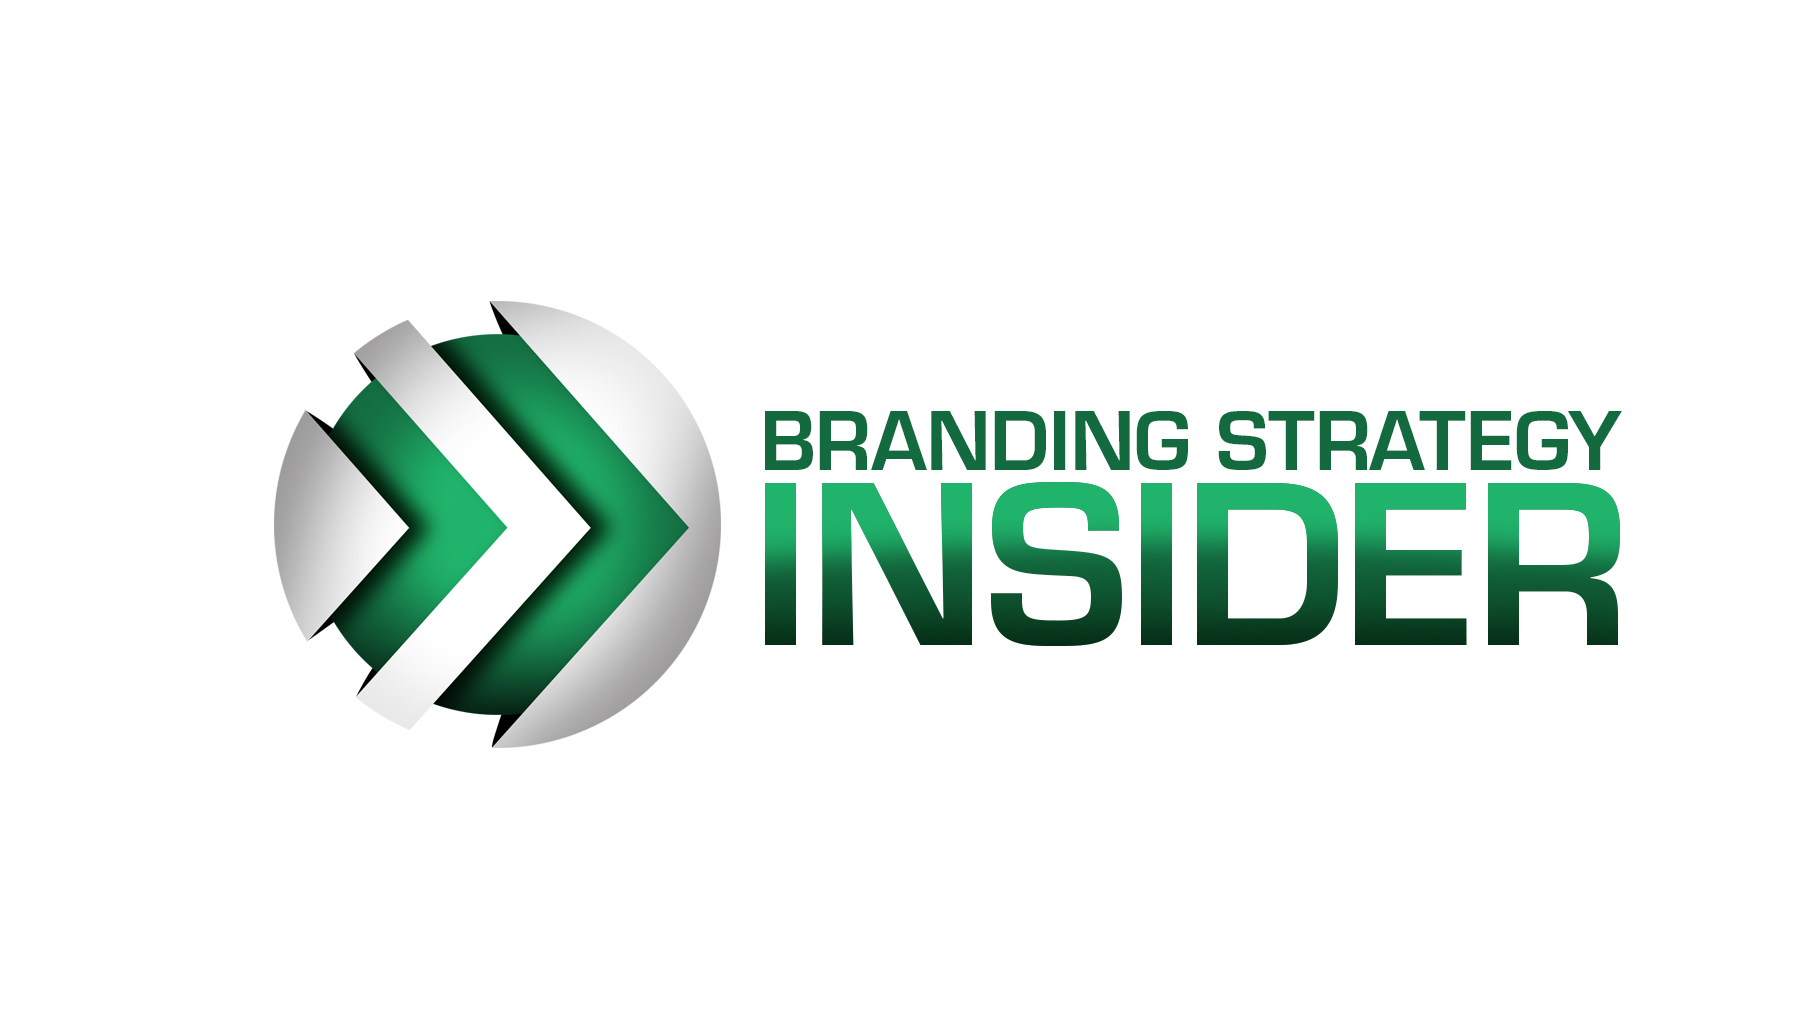 Branding Strategy Insider